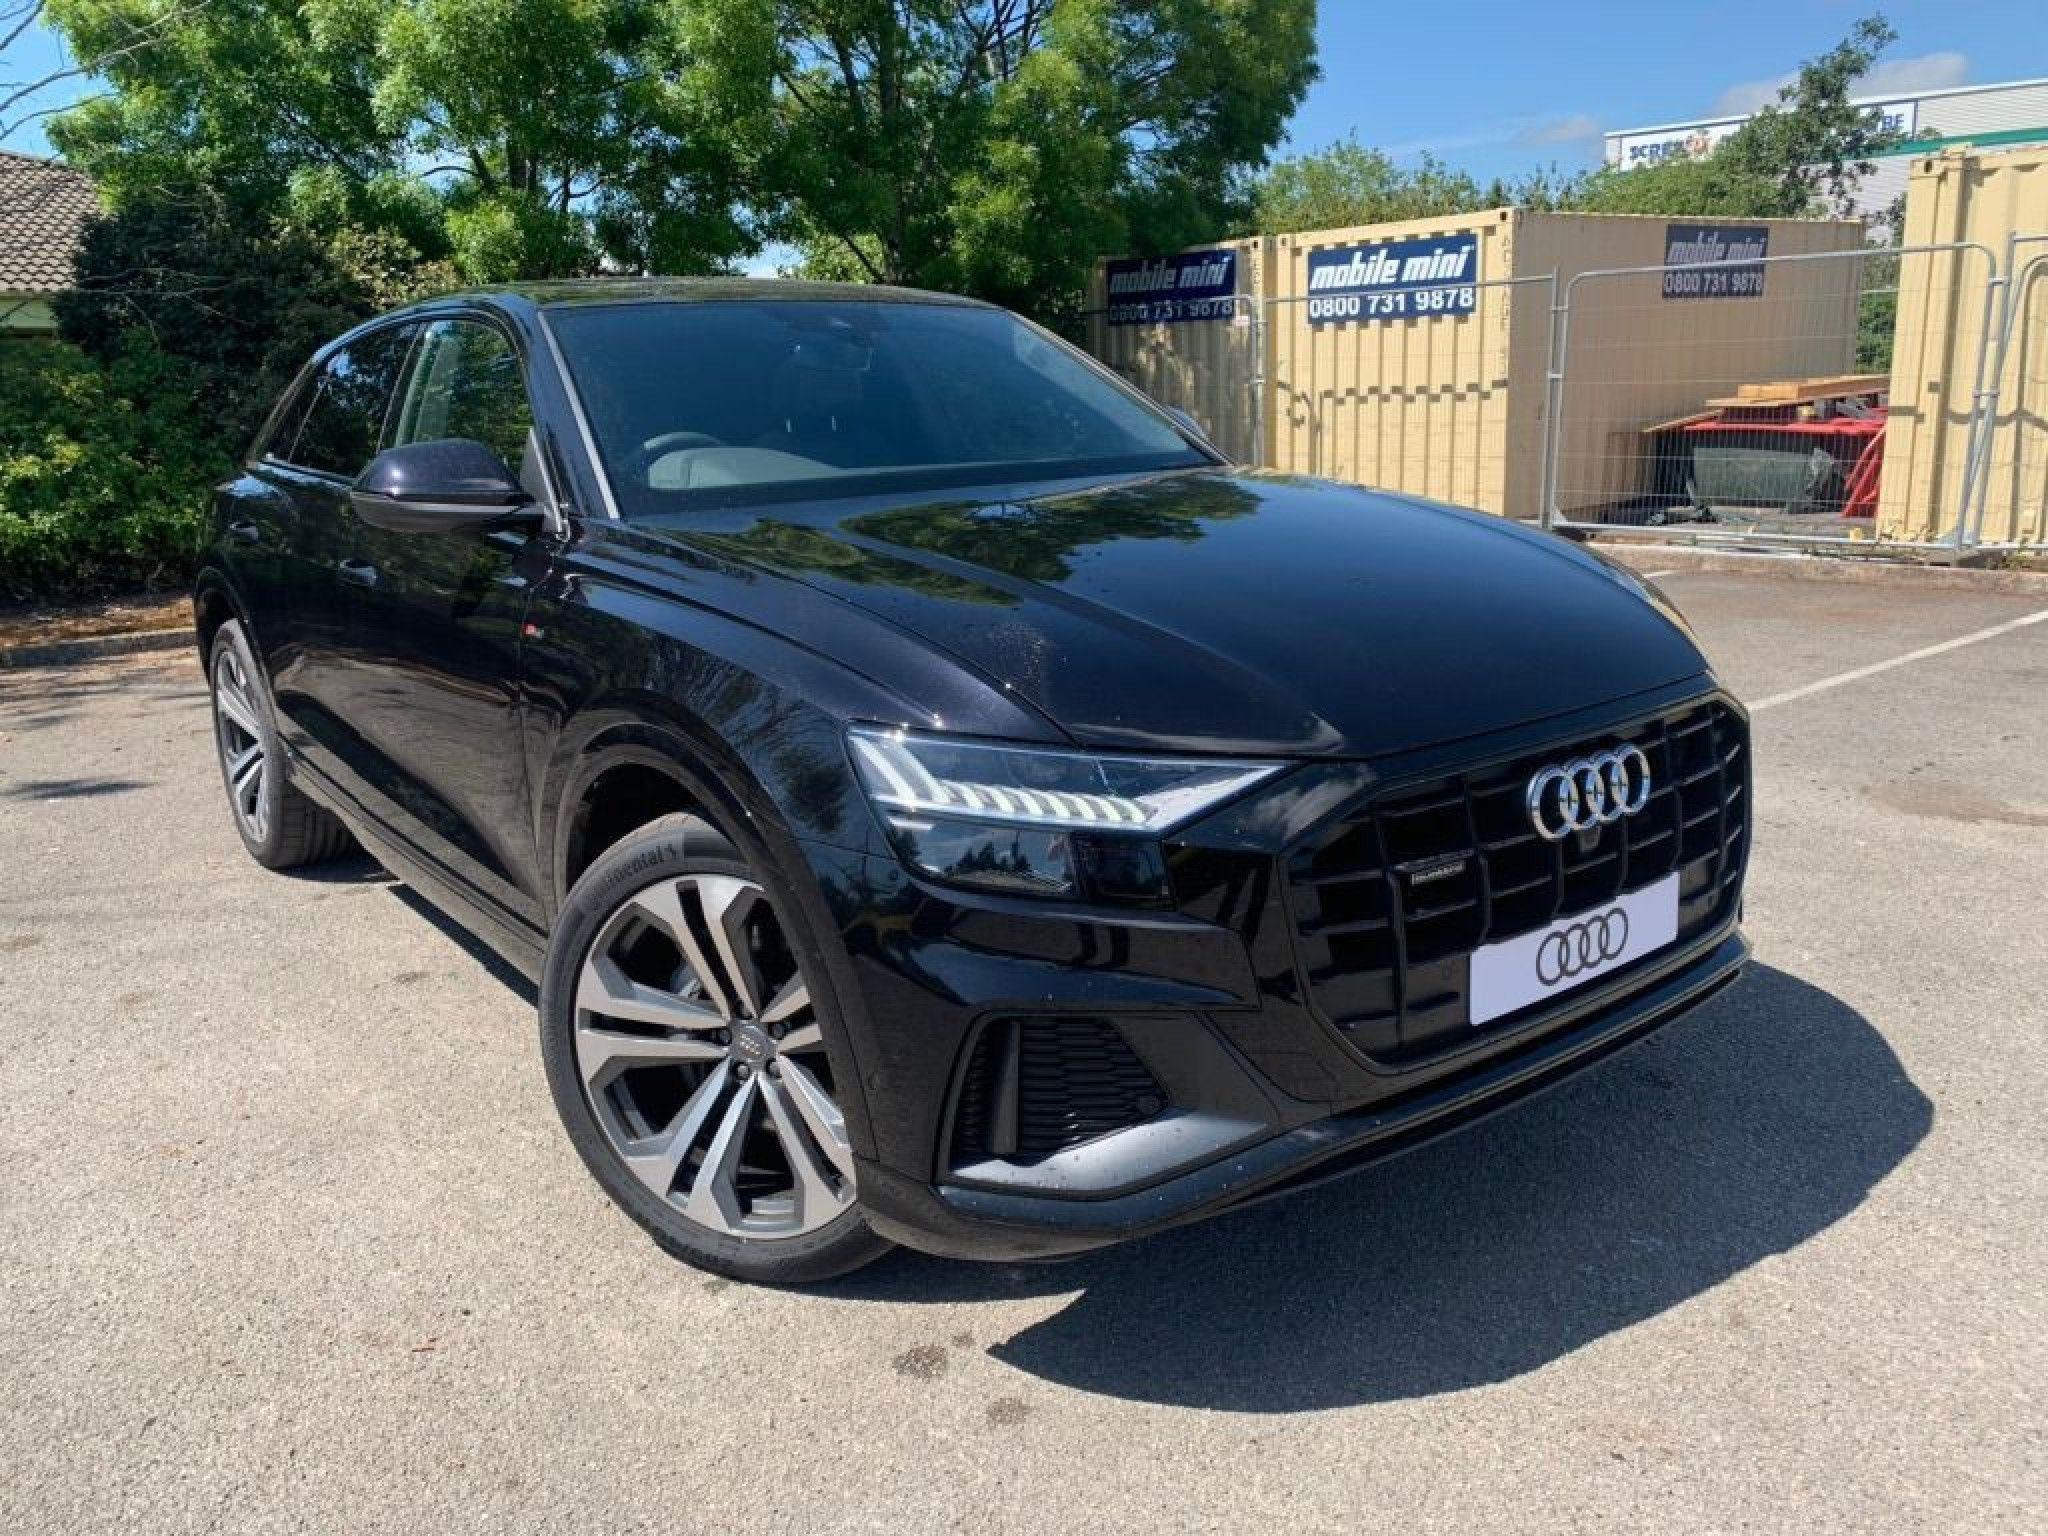 Audi Q8 3 0 Tdi V6 50 Edition 1 Suv 5dr Diesel Tiptronic Quattro S S 286 Ps For Sale In 2020 Used Audi Audi Dream Cars